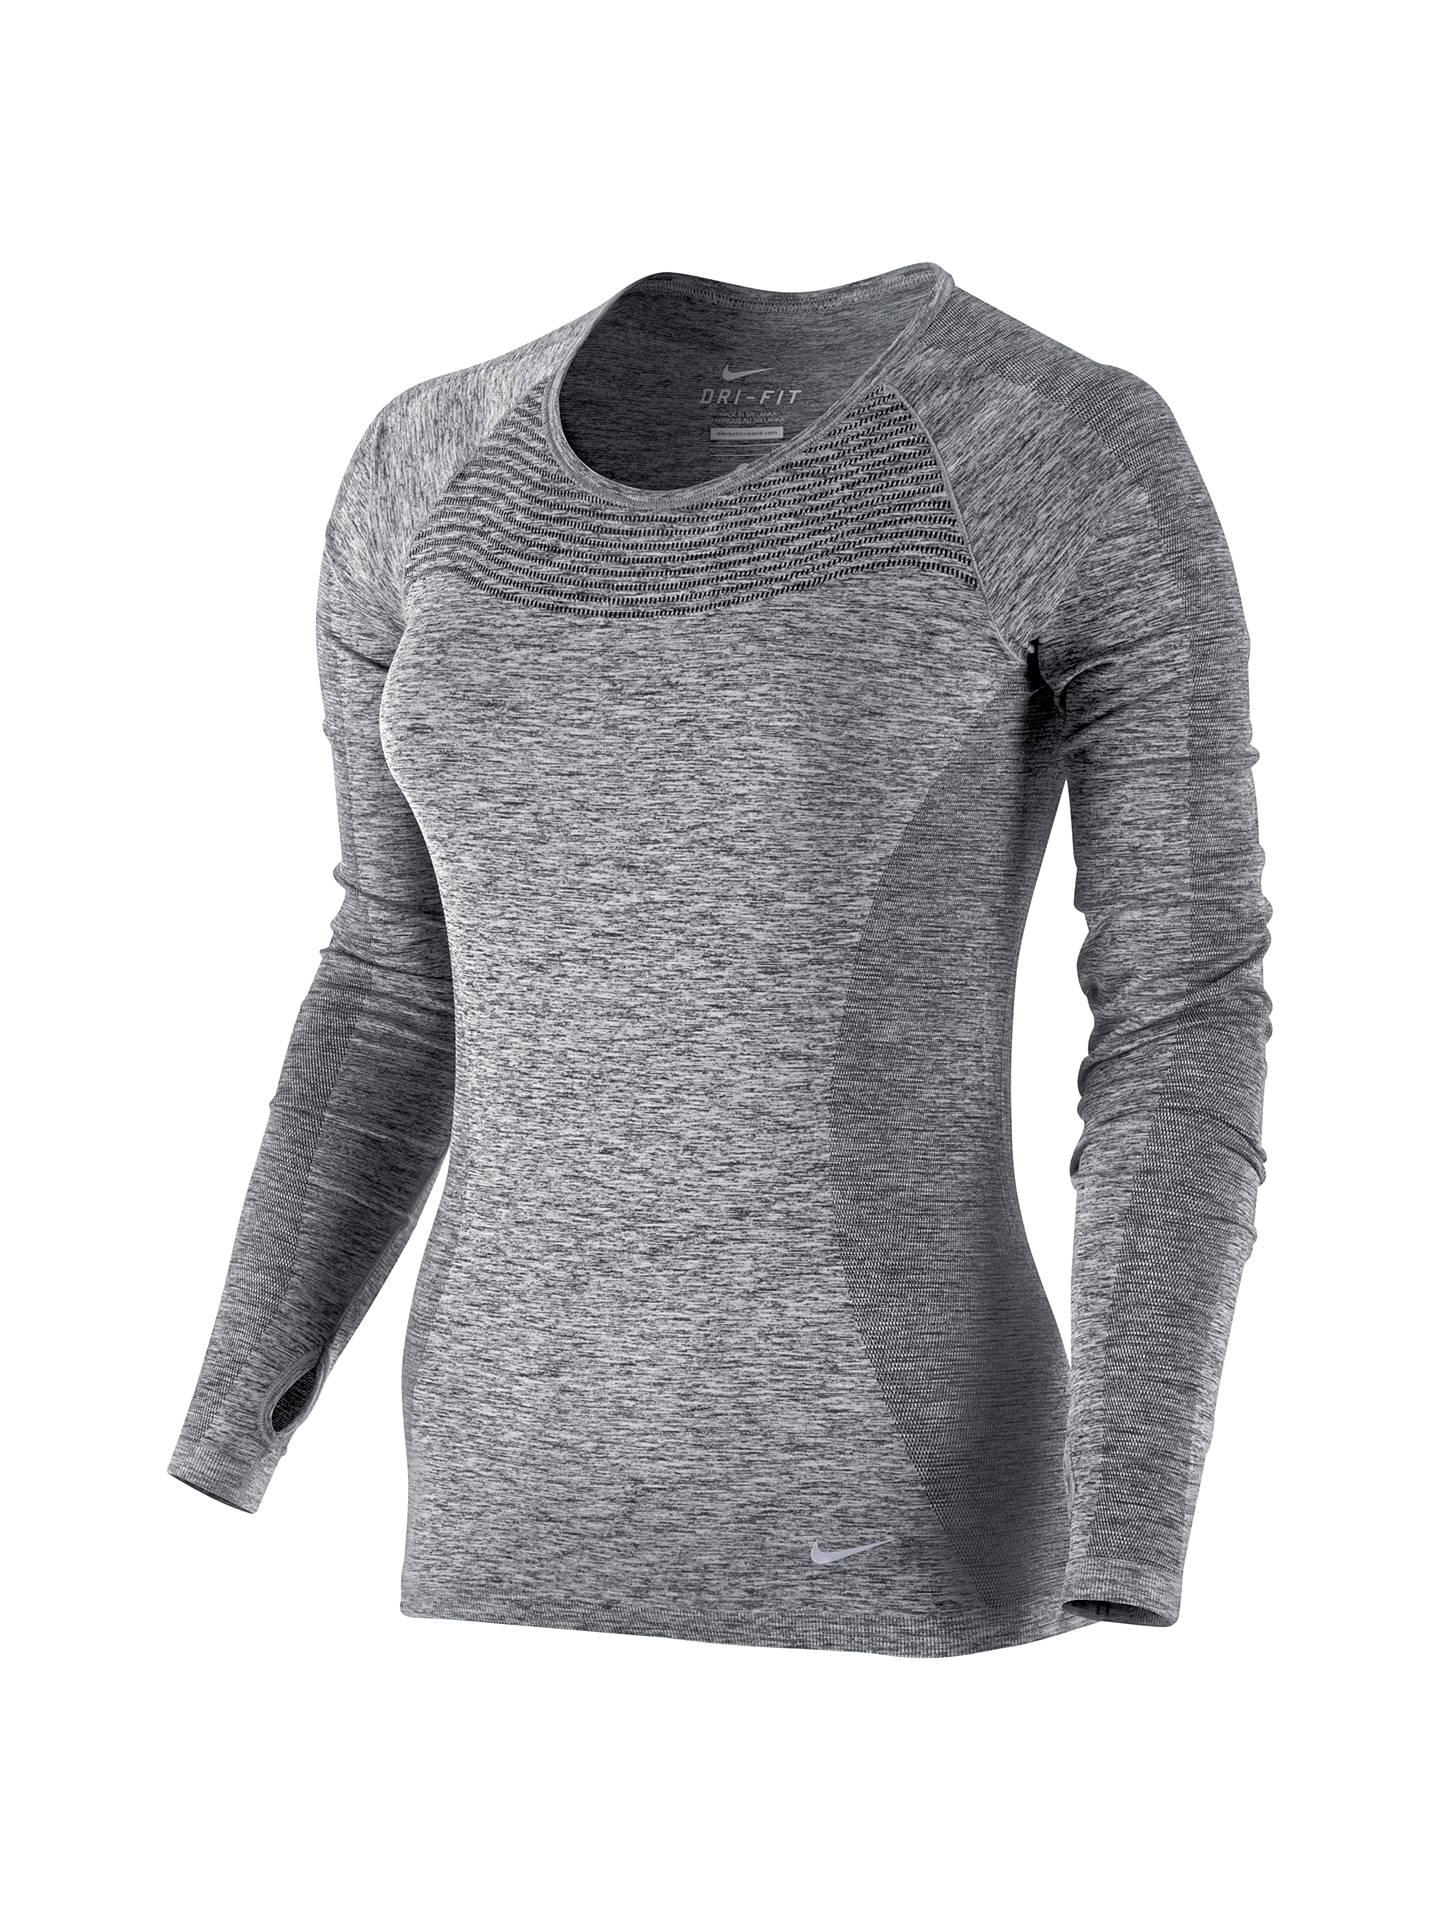 187f3d19e4a6 Nike Dri-FIT Knit Long Sleeve Running Top at John Lewis   Partners